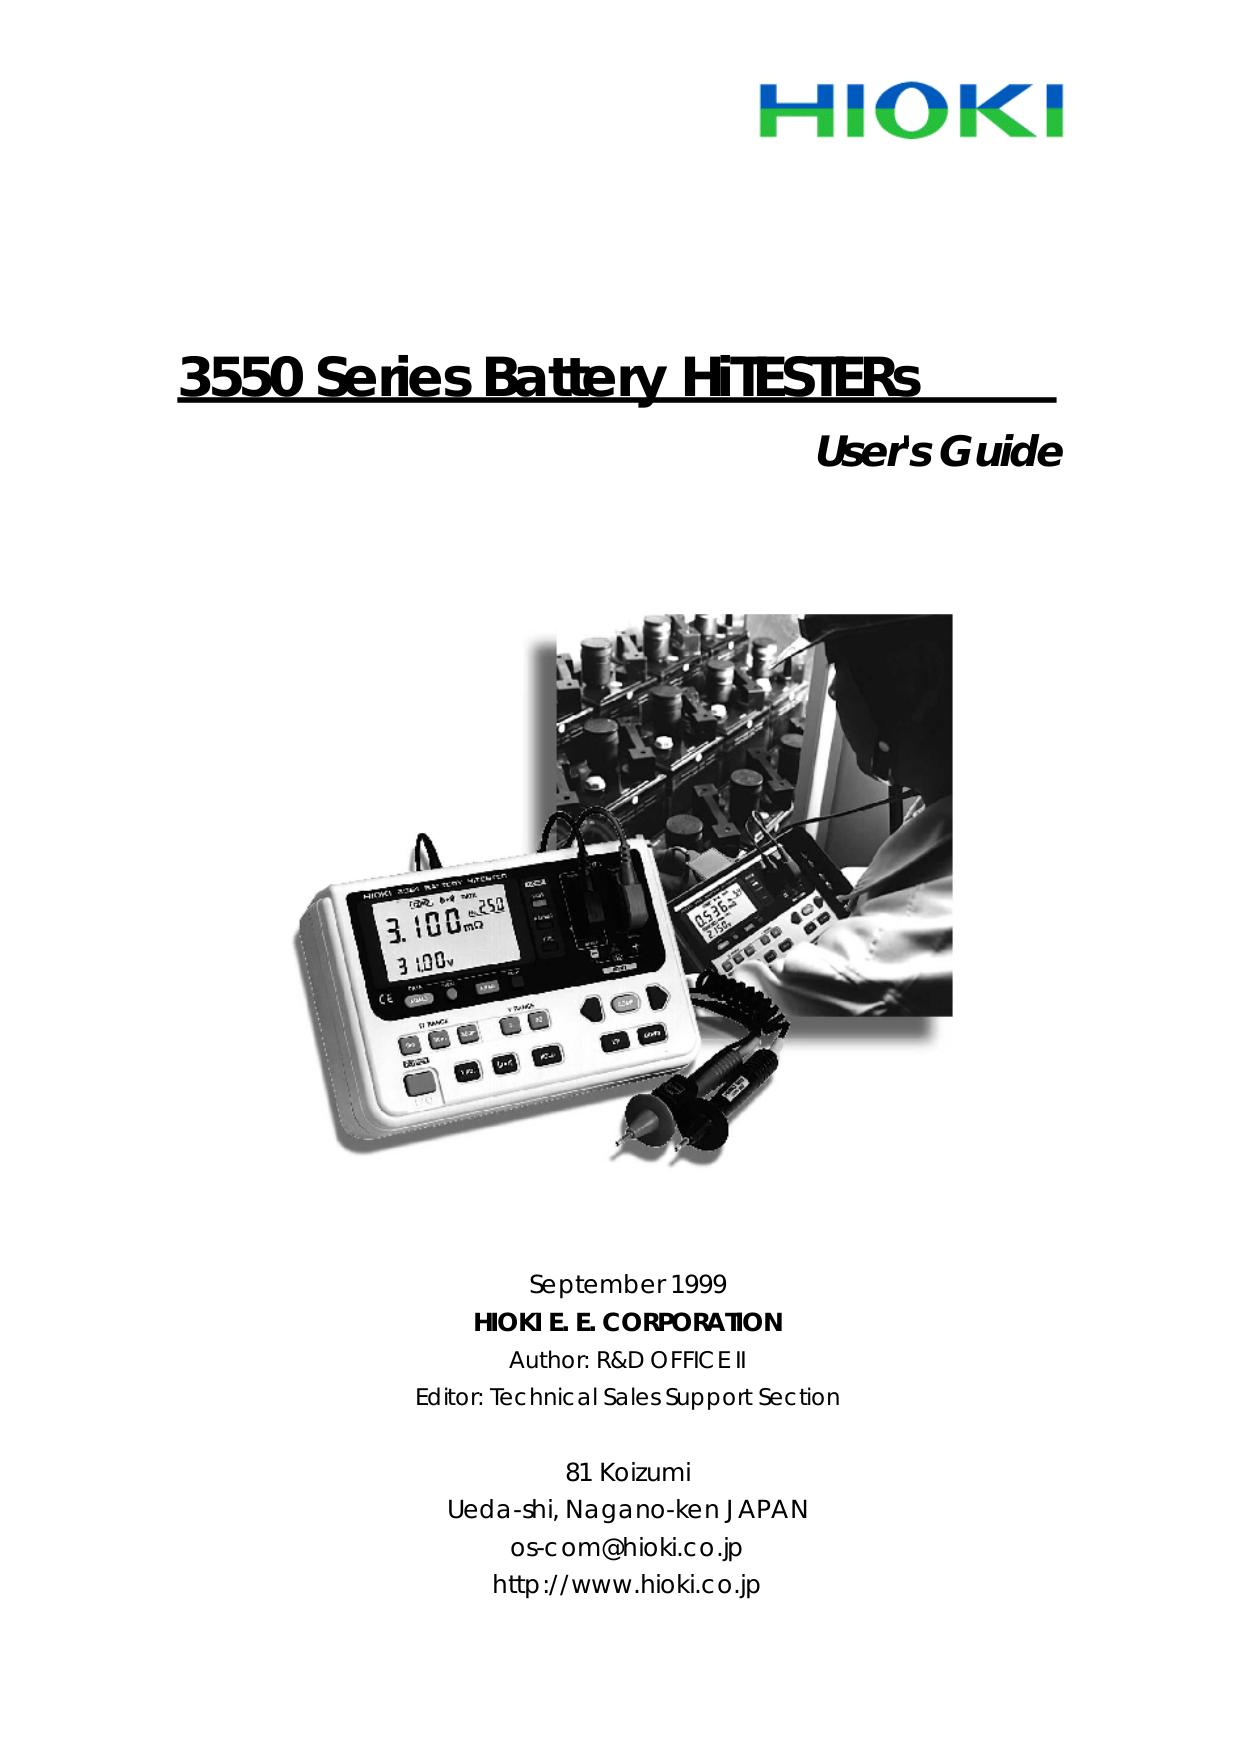 download free pdf for westinghouse vr 3225 tv manual rh umlib com Westinghouse 32 LCD TV Grey Westinghouse 32 LCD TV Grey